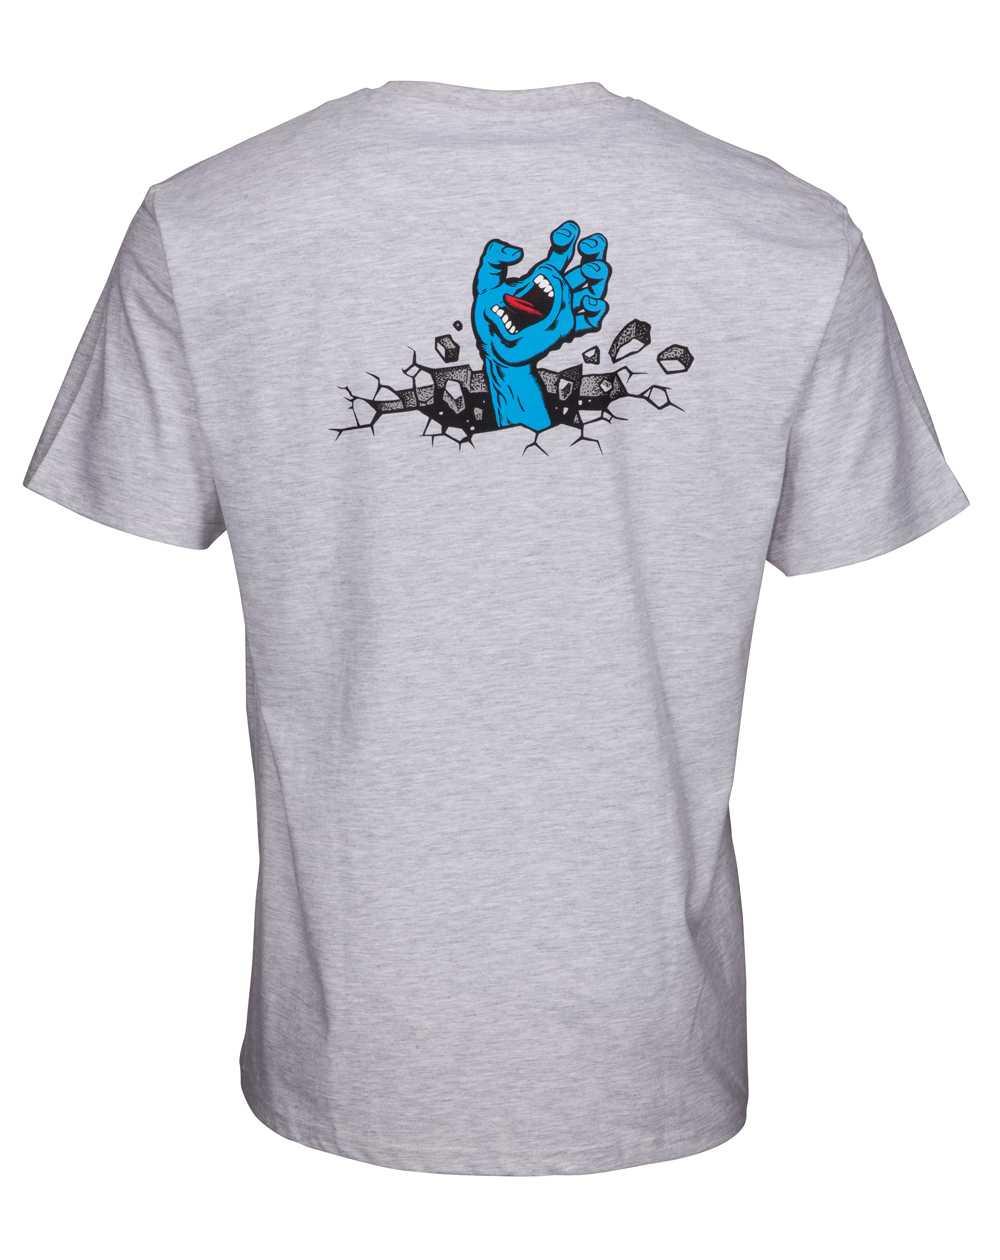 Santa Cruz Hand Wall T-Shirt Uomo Atlethic Heather